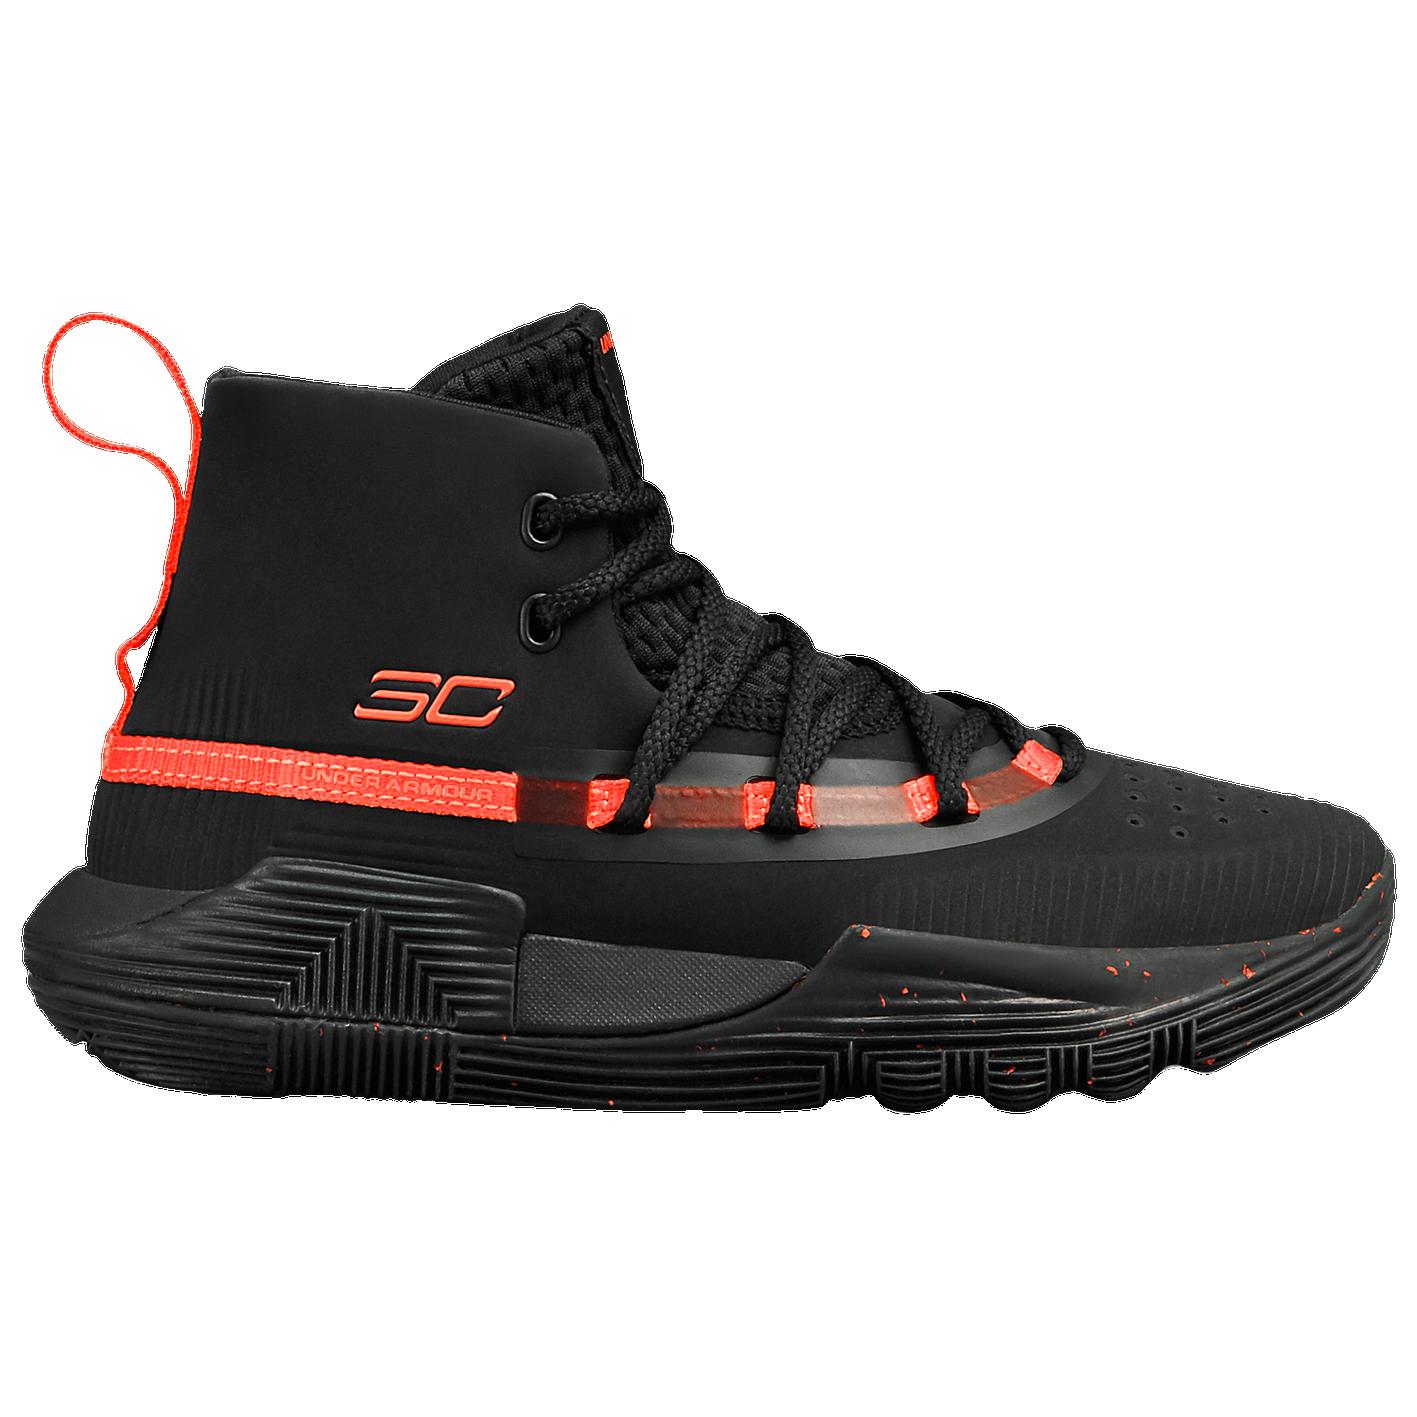 d2fc8b1bd165 Under Armour Curry 3Zero II - Boys  Preschool - Basketball - Shoes ...